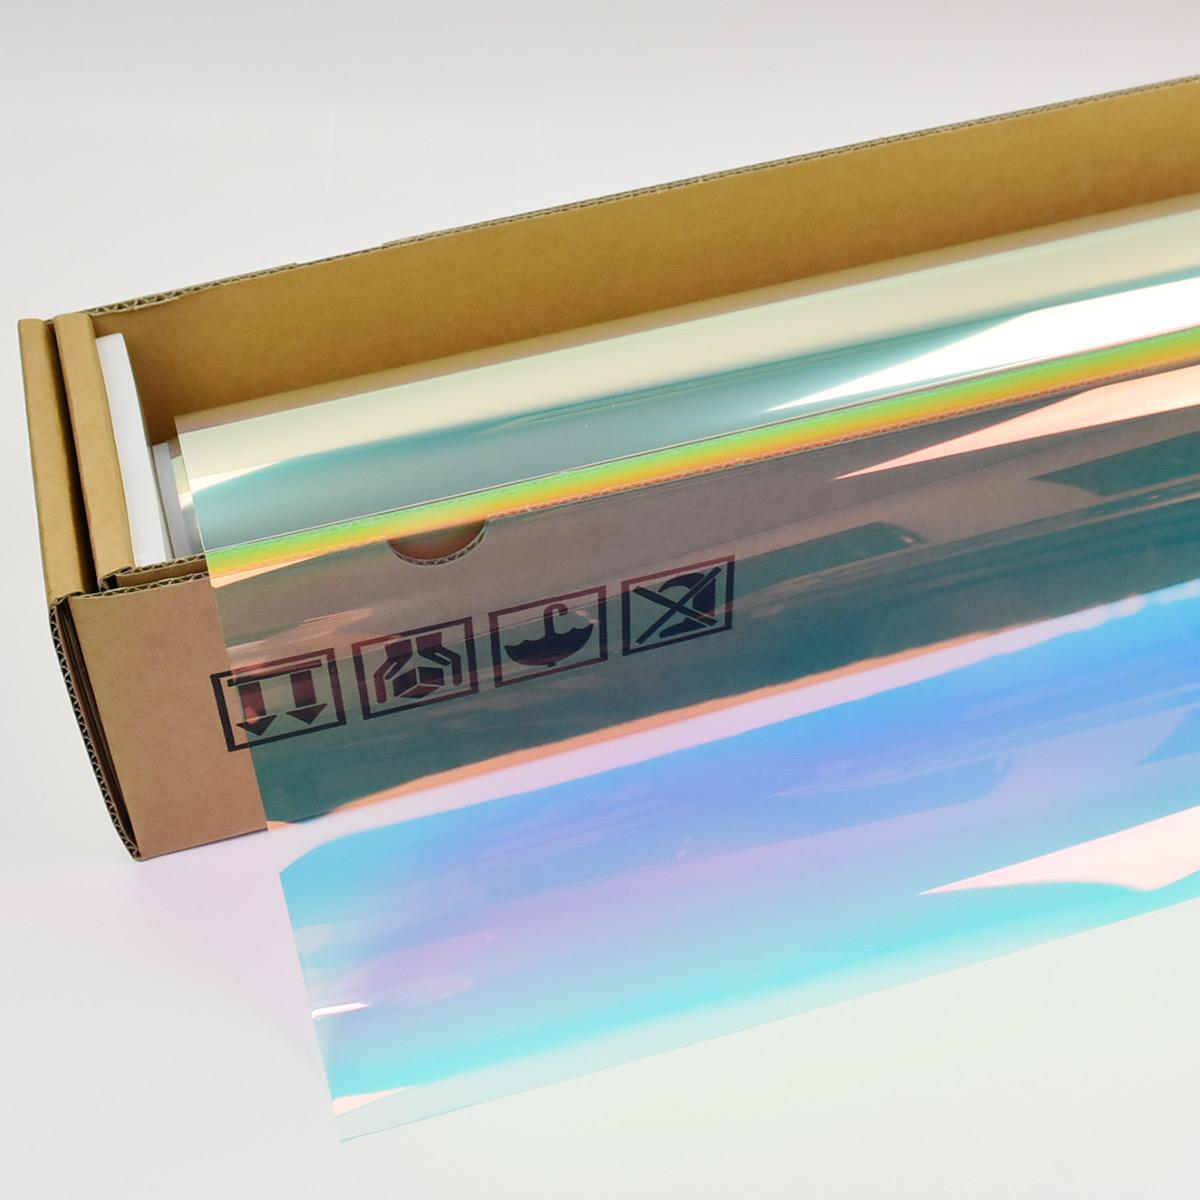 Newタイプ 多層高反射 高発色 プリズムフィルム FUNKY GHOST ファンキーゴースト #PR99 プリズムフィルム99 Roll# プリズム99 多層マルチレイヤー 高級な 20 50cm幅×30mロール箱売 上等